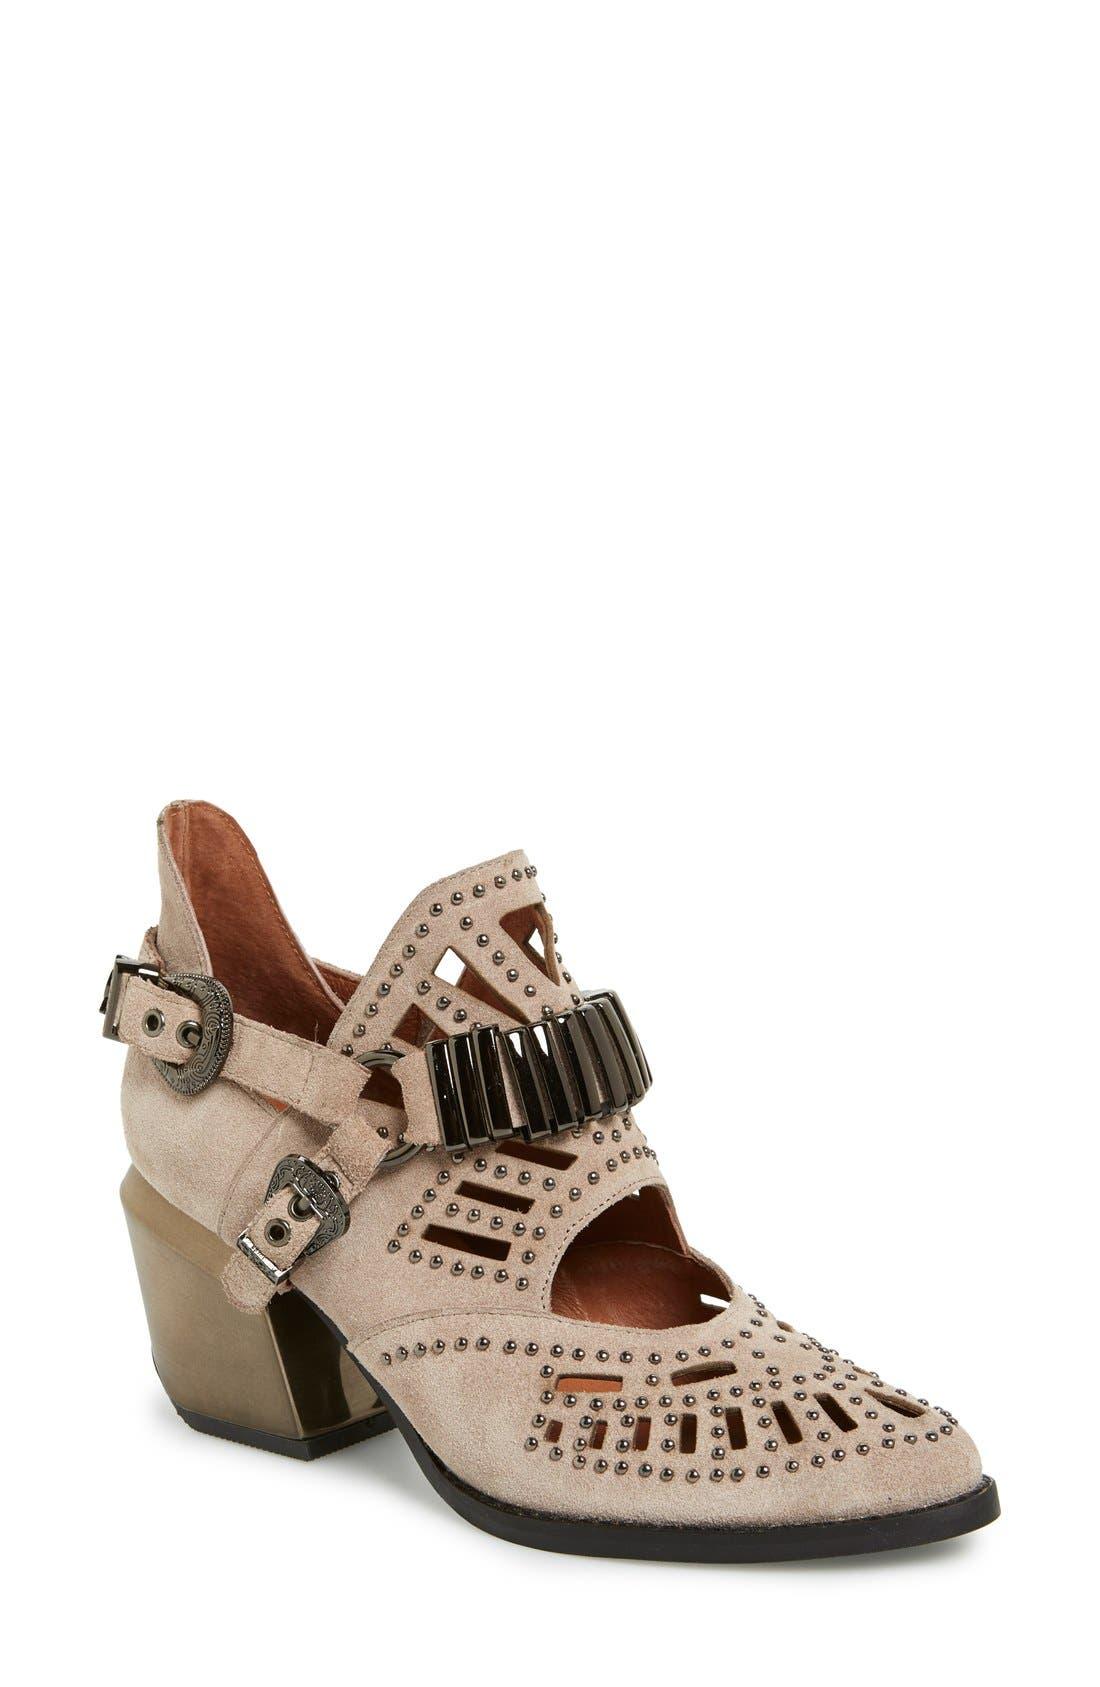 Alternate Image 1 Selected - Jeffrey Campbell 'Calhoun' Ankle Boot (Women)